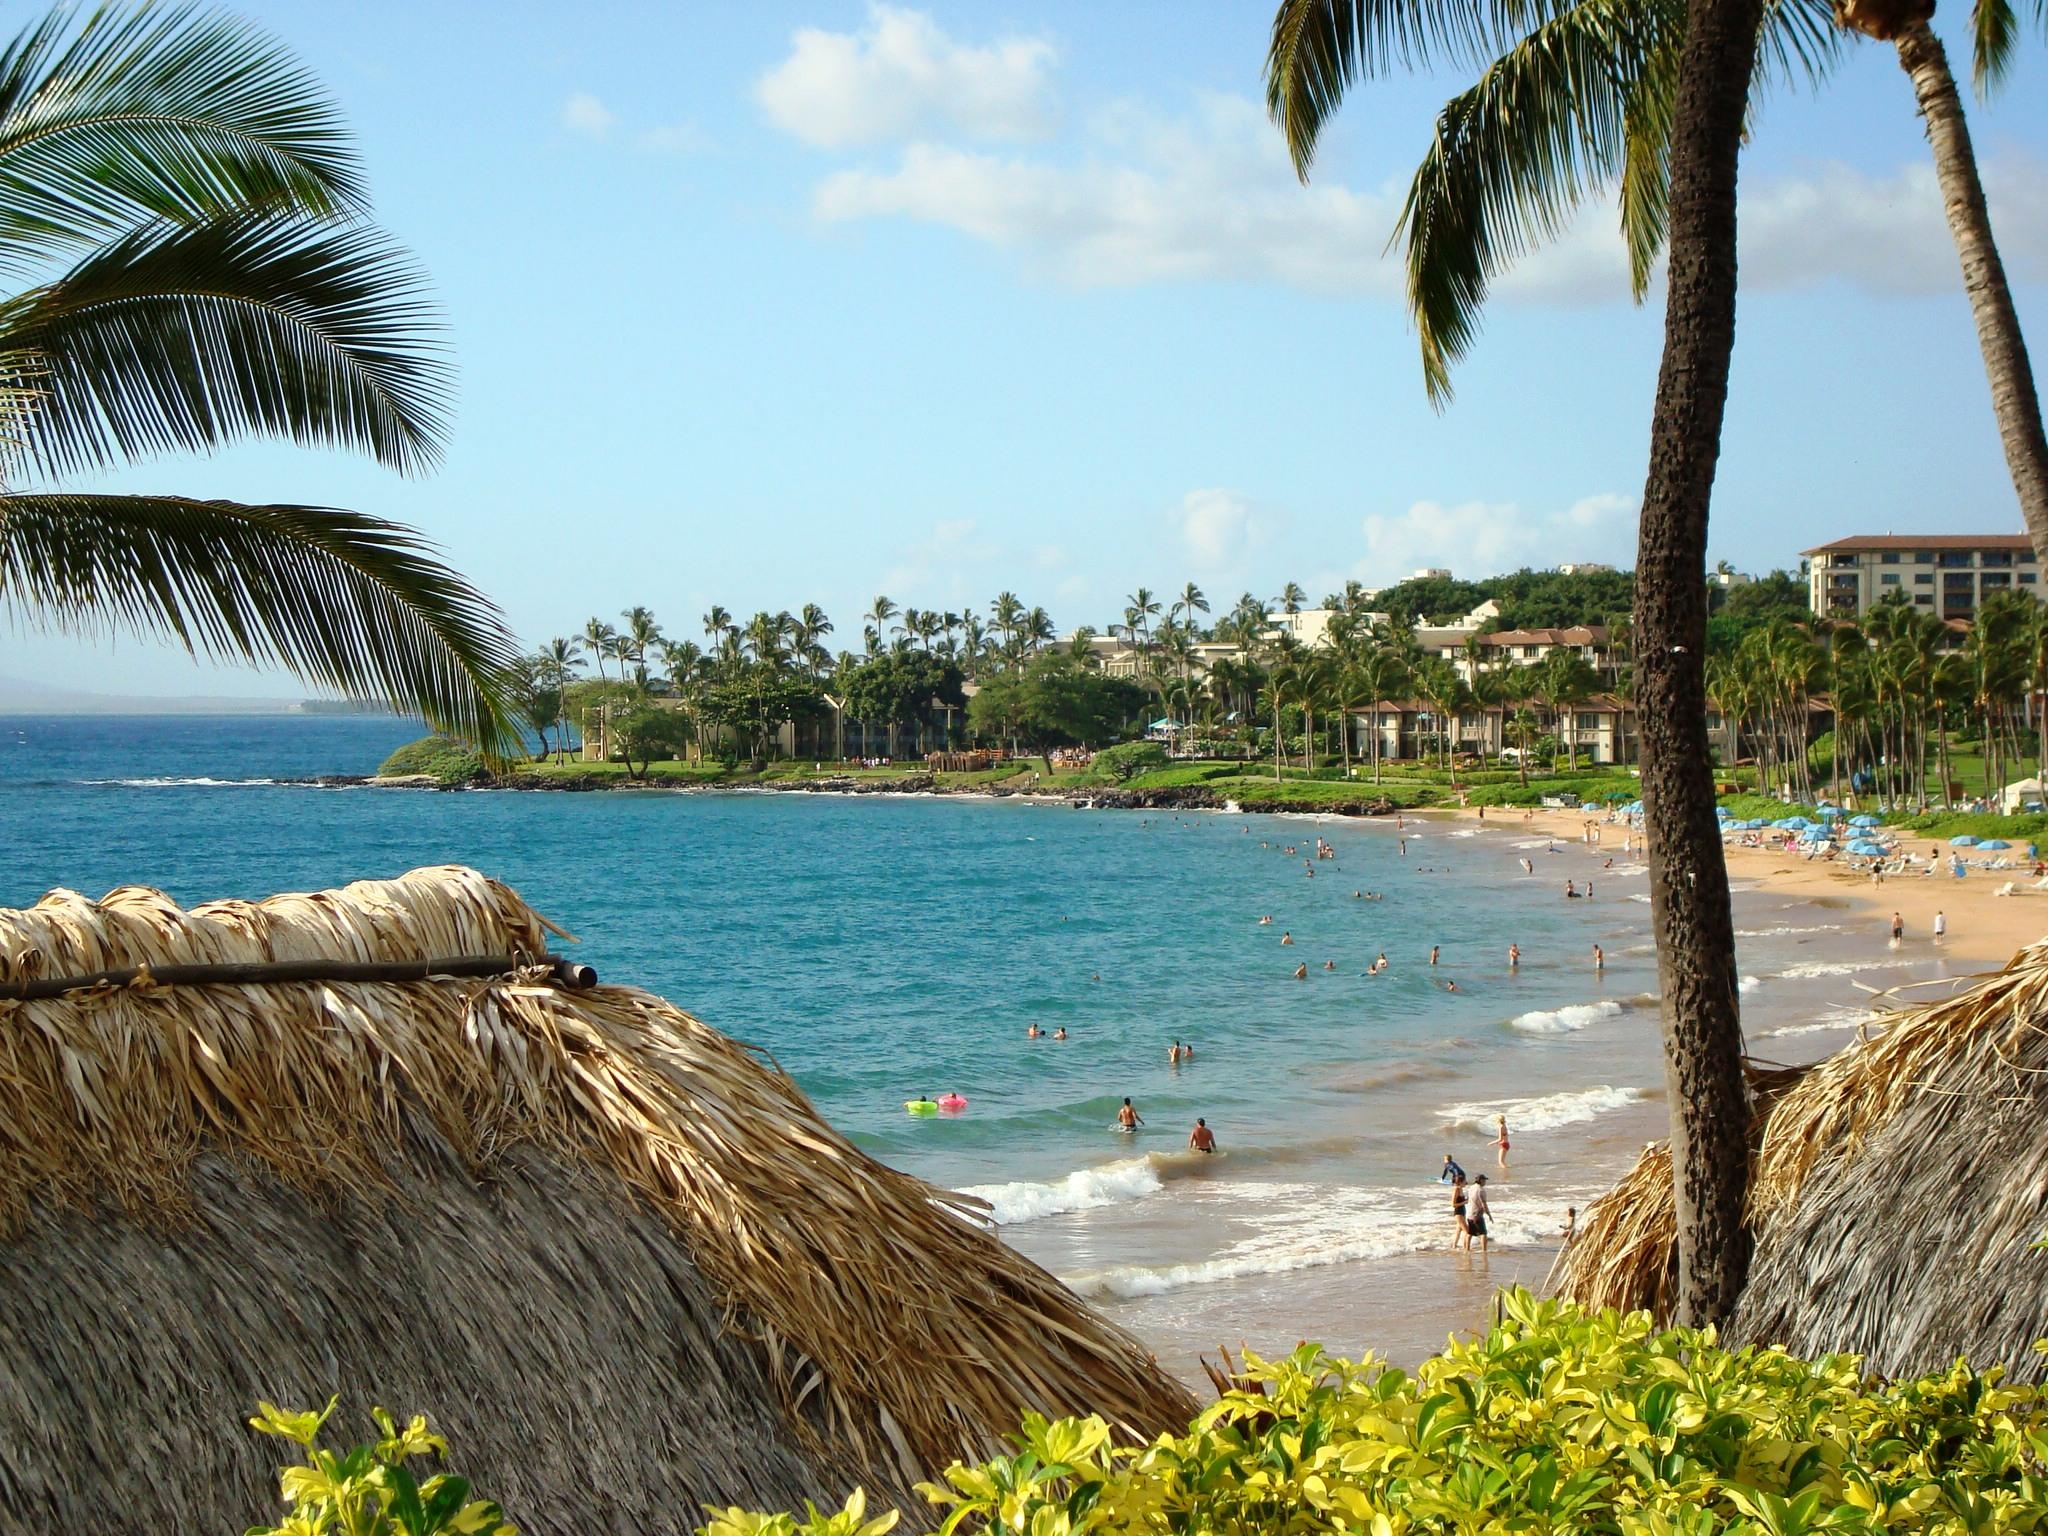 Four Seasons beach, Maui